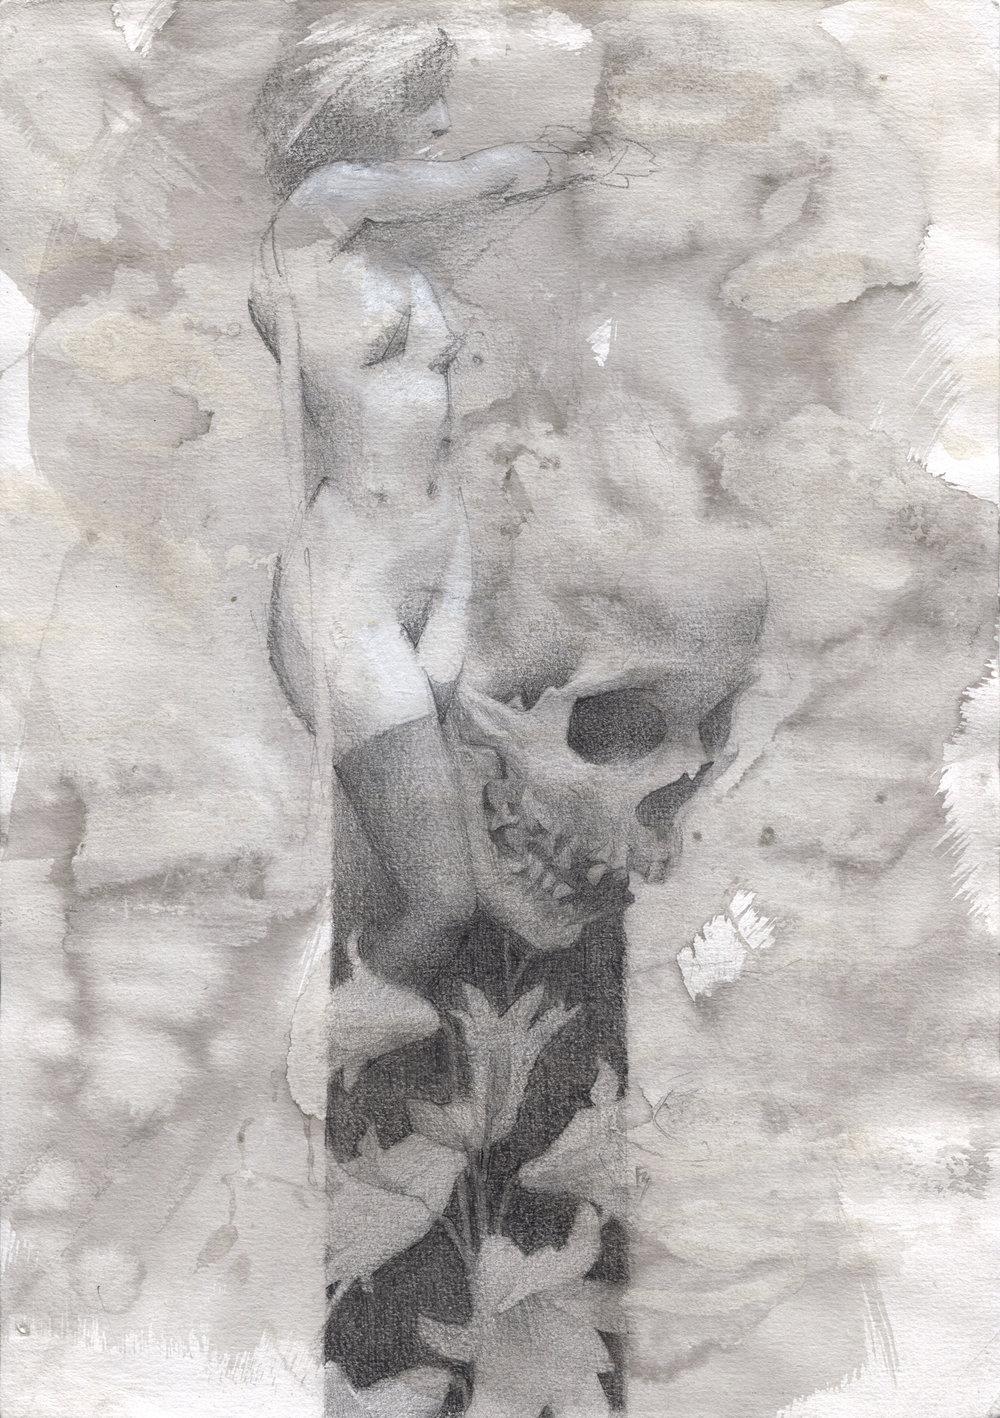 Florian_Boschitsch_Bron_Death_Dance-5.jpg